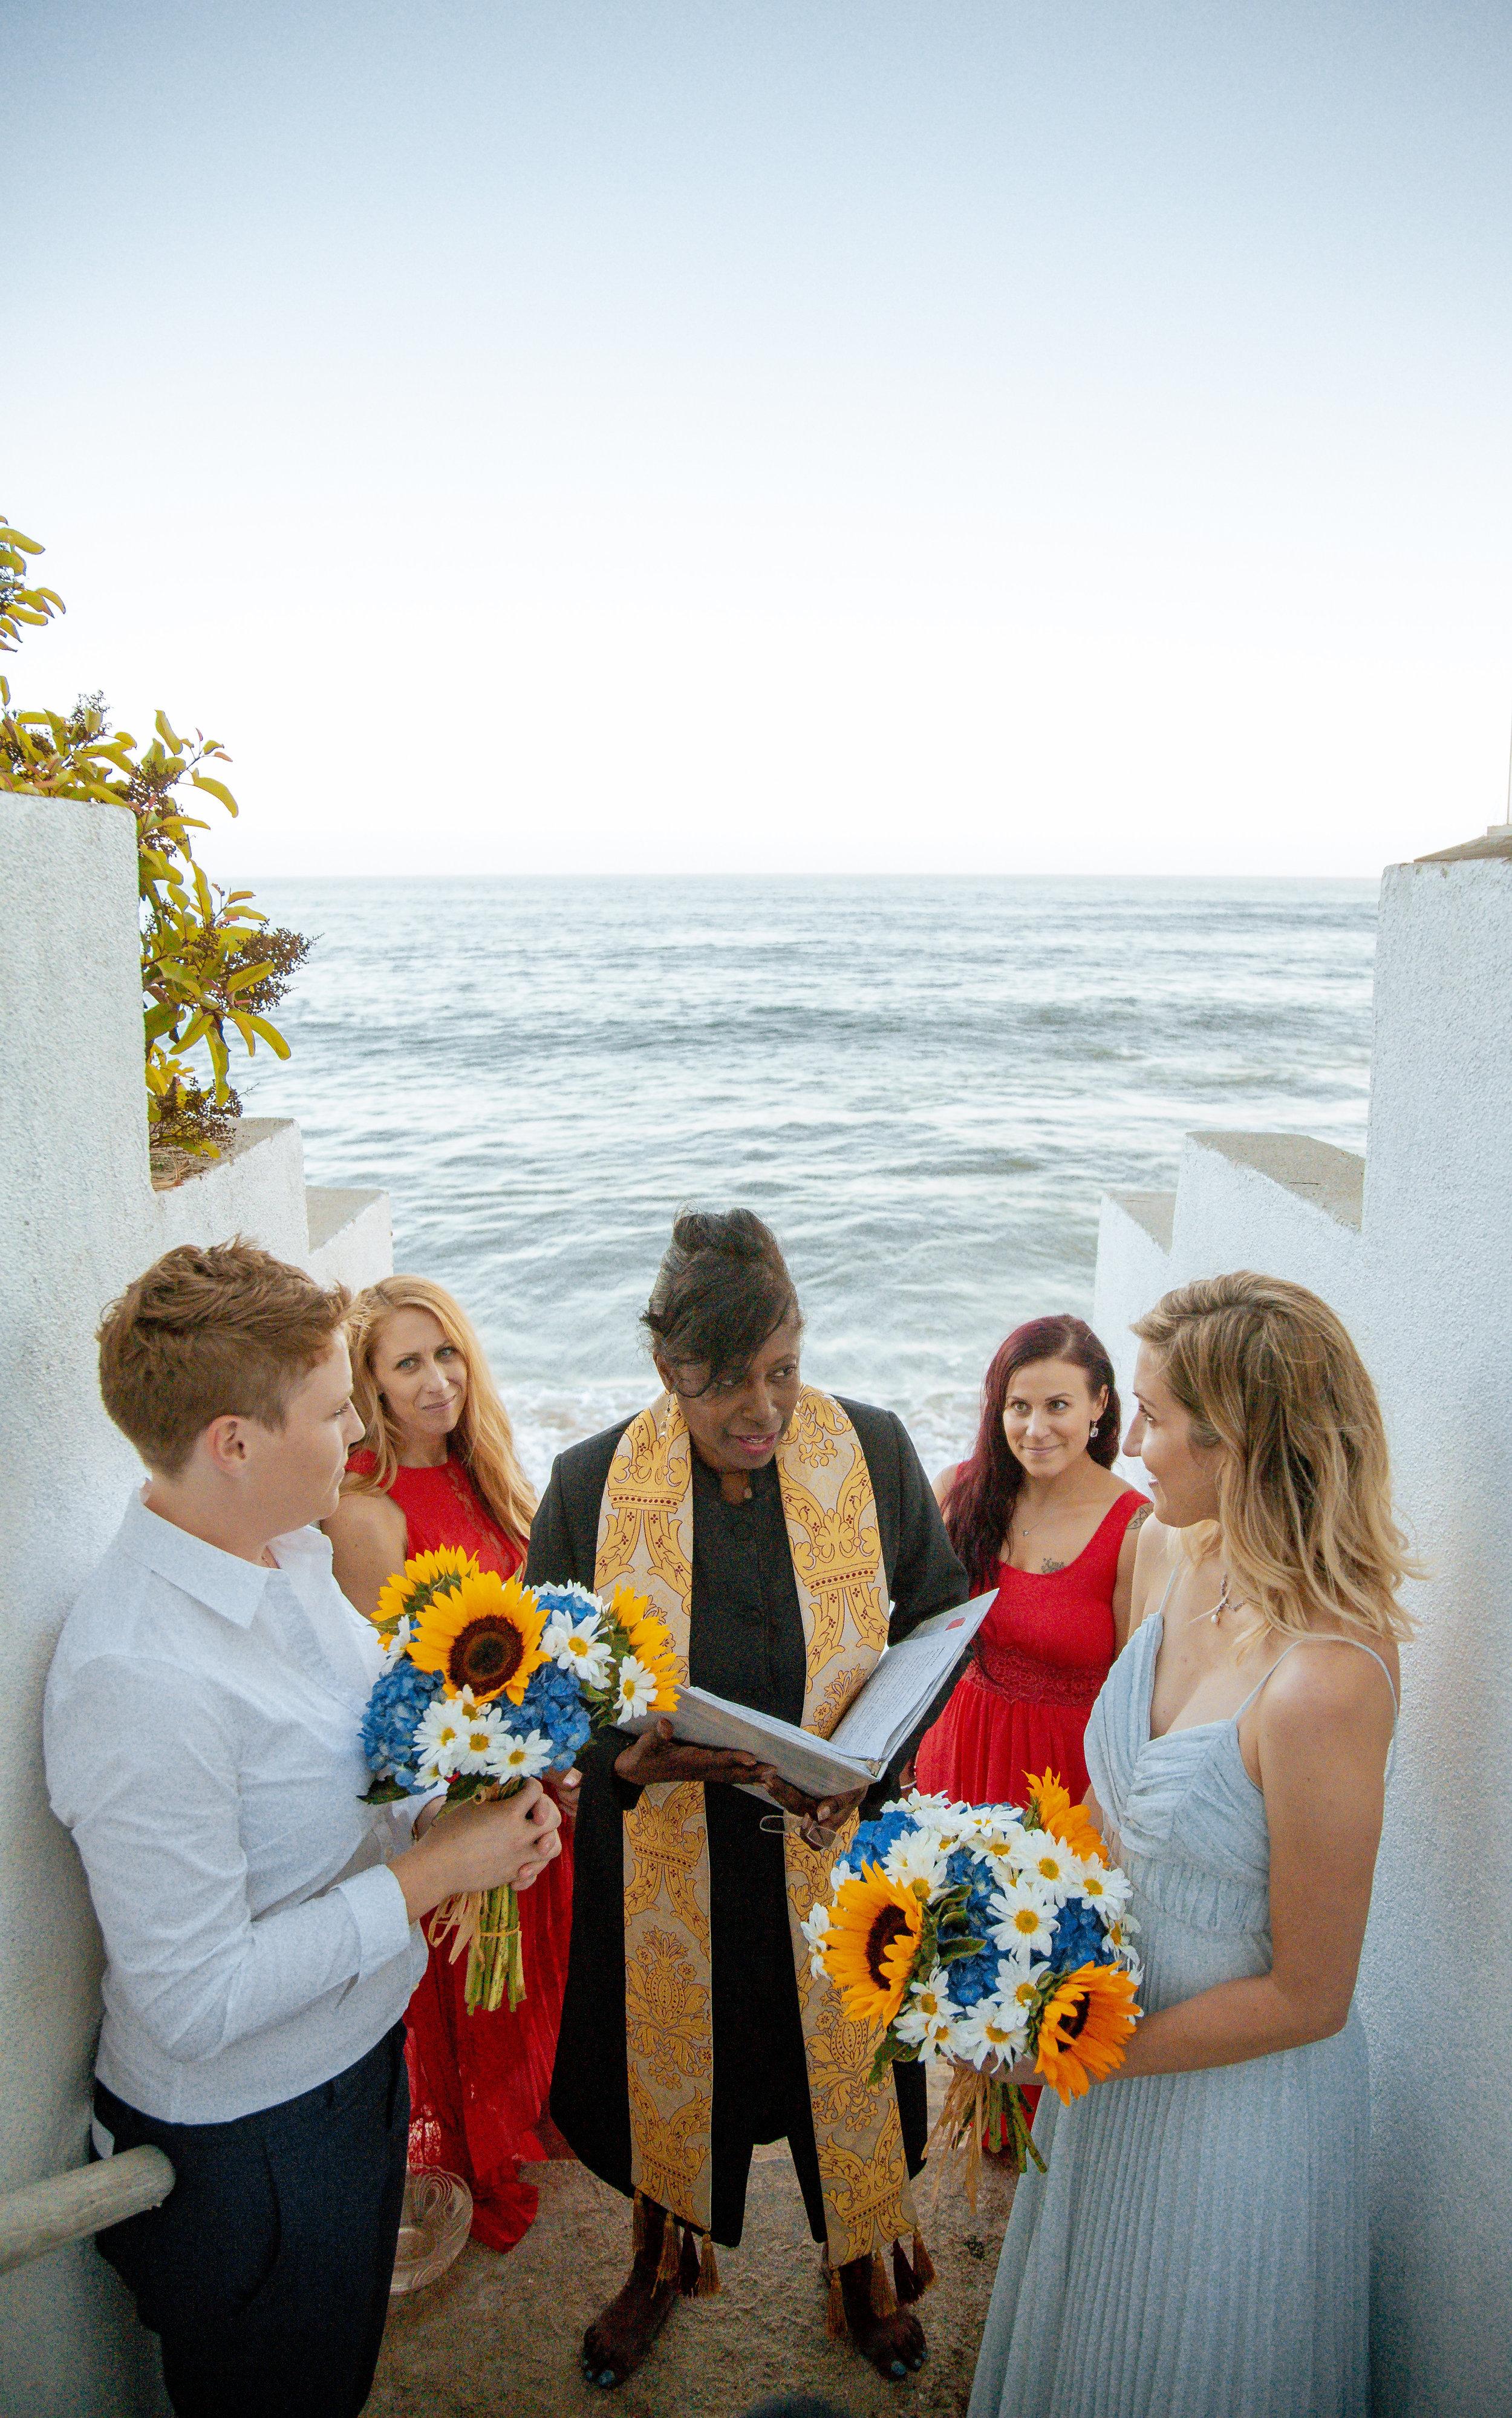 Hannah_&_Kates_Wedding_Oct_5th_2018_0_29.JPG